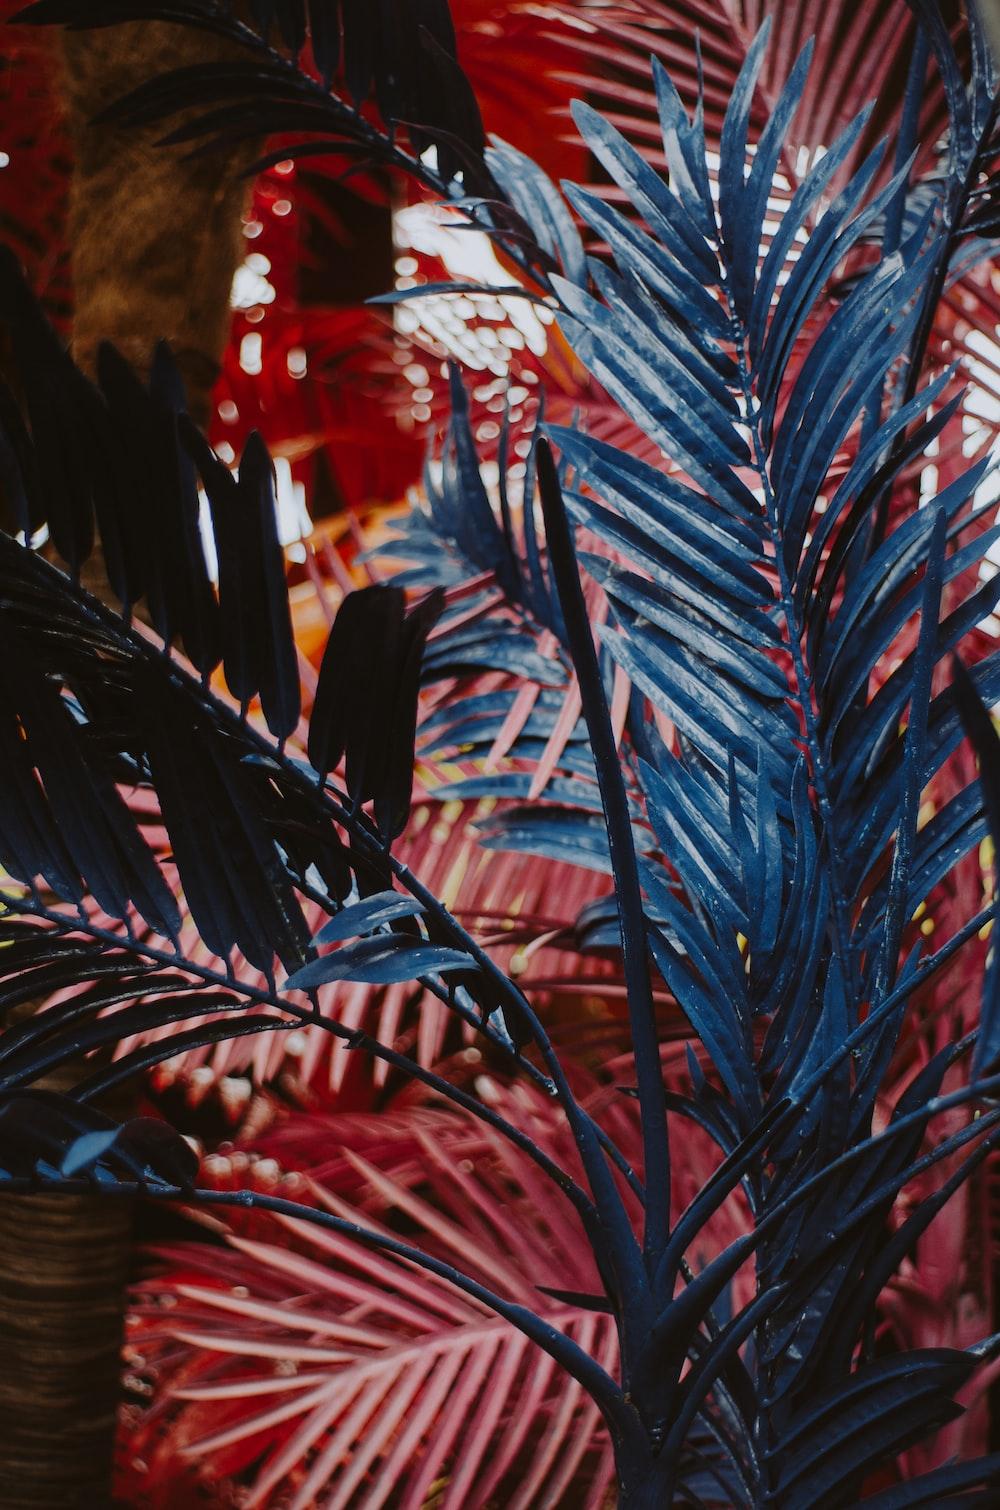 blue leafed plant during daytime